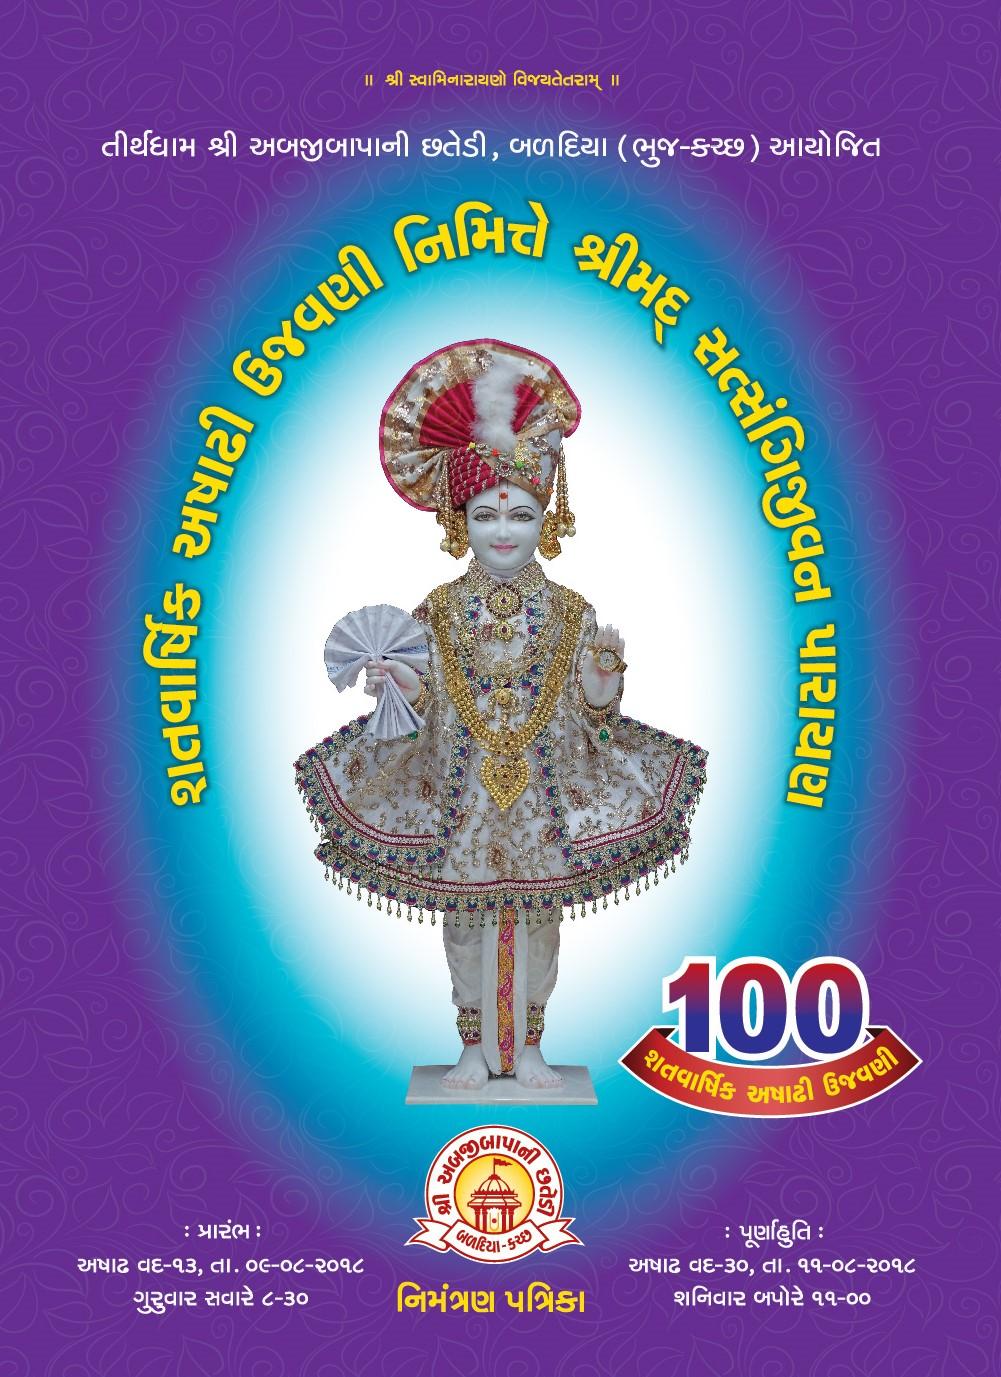 Watch Ashadhi Parayan